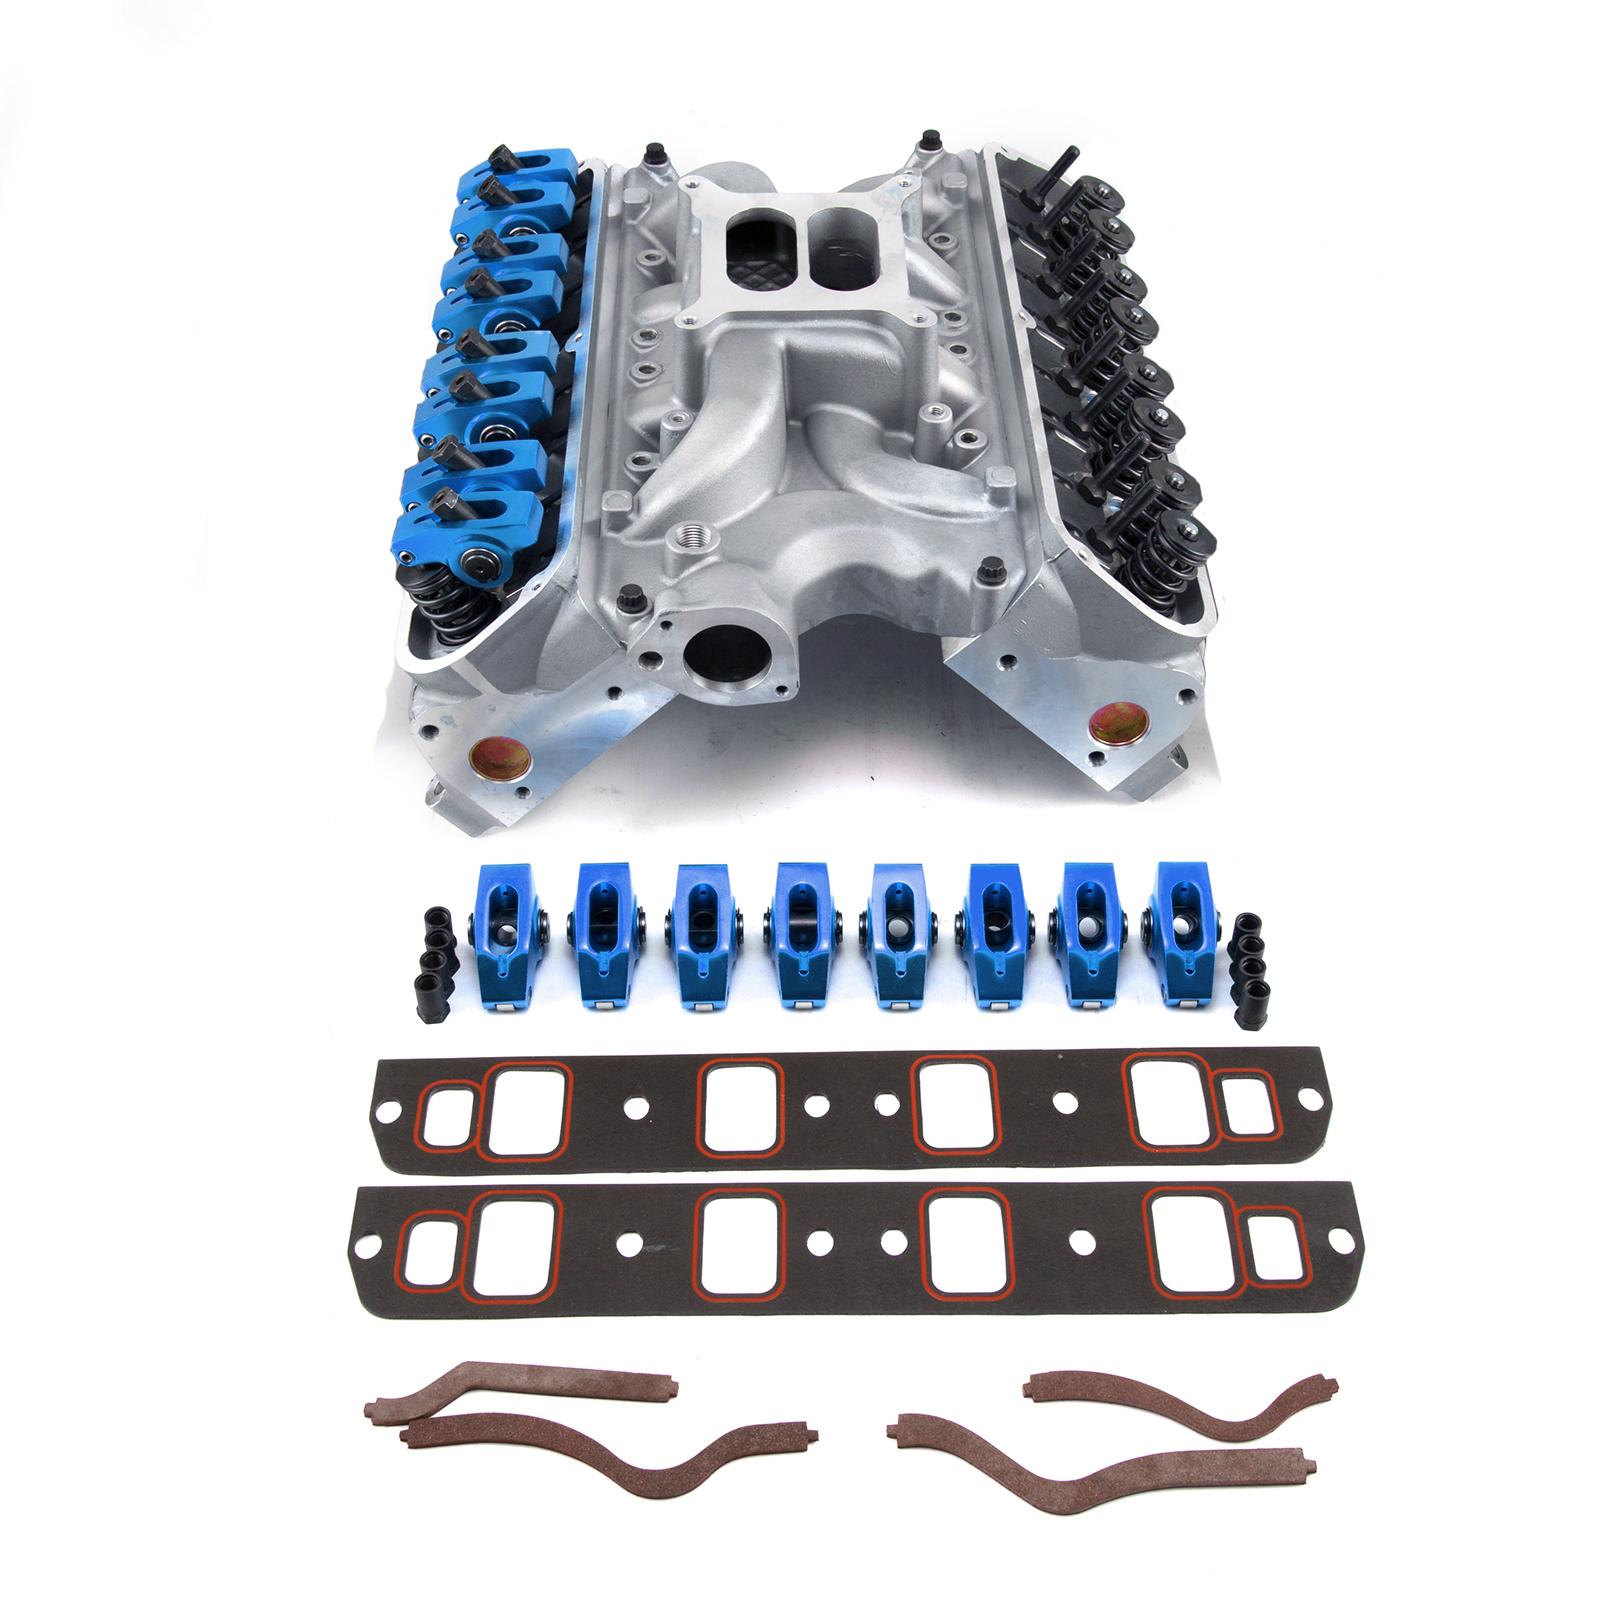 Ford SB 289 302 Windsor Hyd FT Cylinder Head Top End Engine Combo Kit